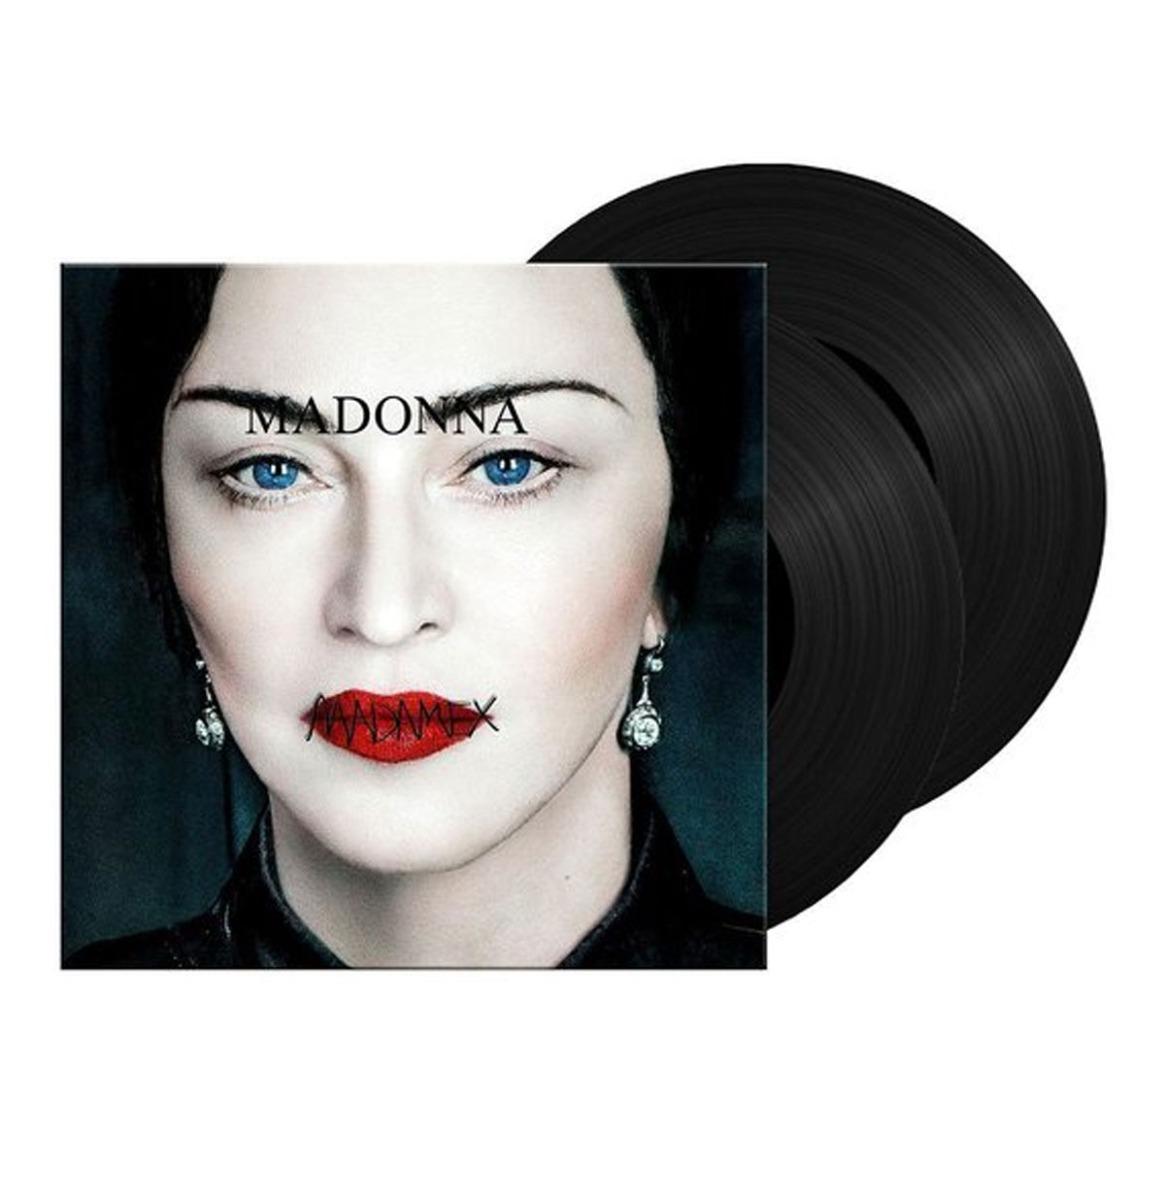 Madonna - Madame X - 2-LP